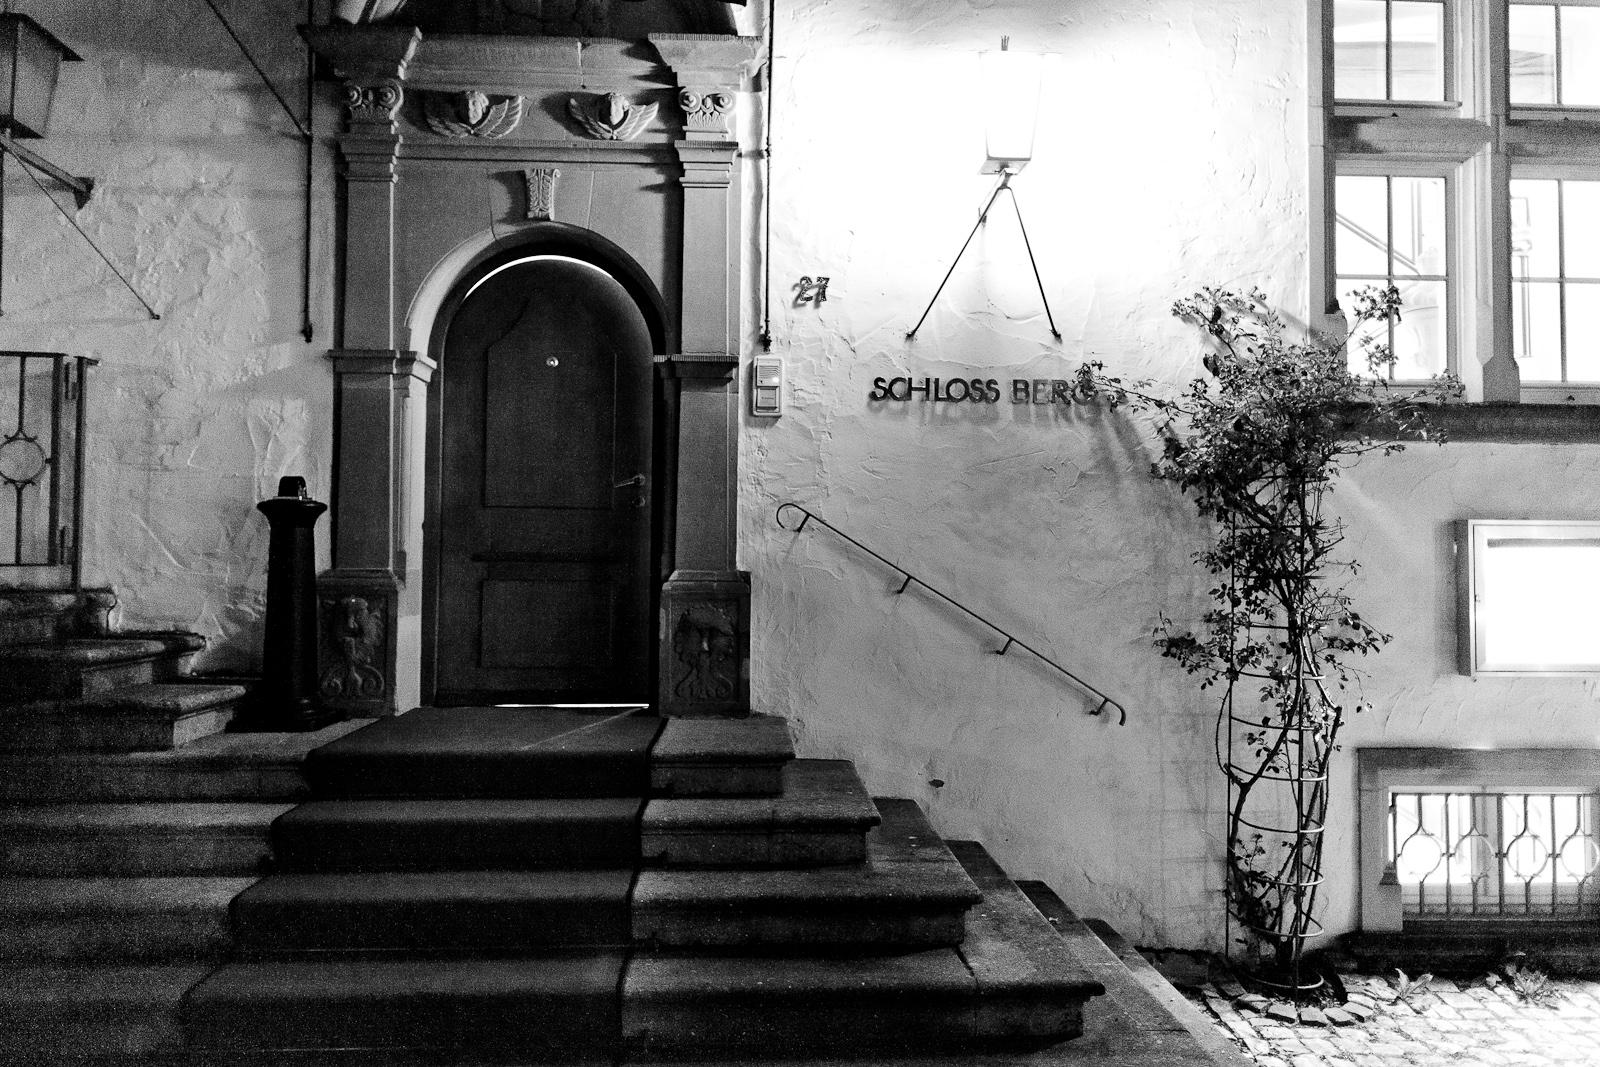 Entrance to Schloss Berg